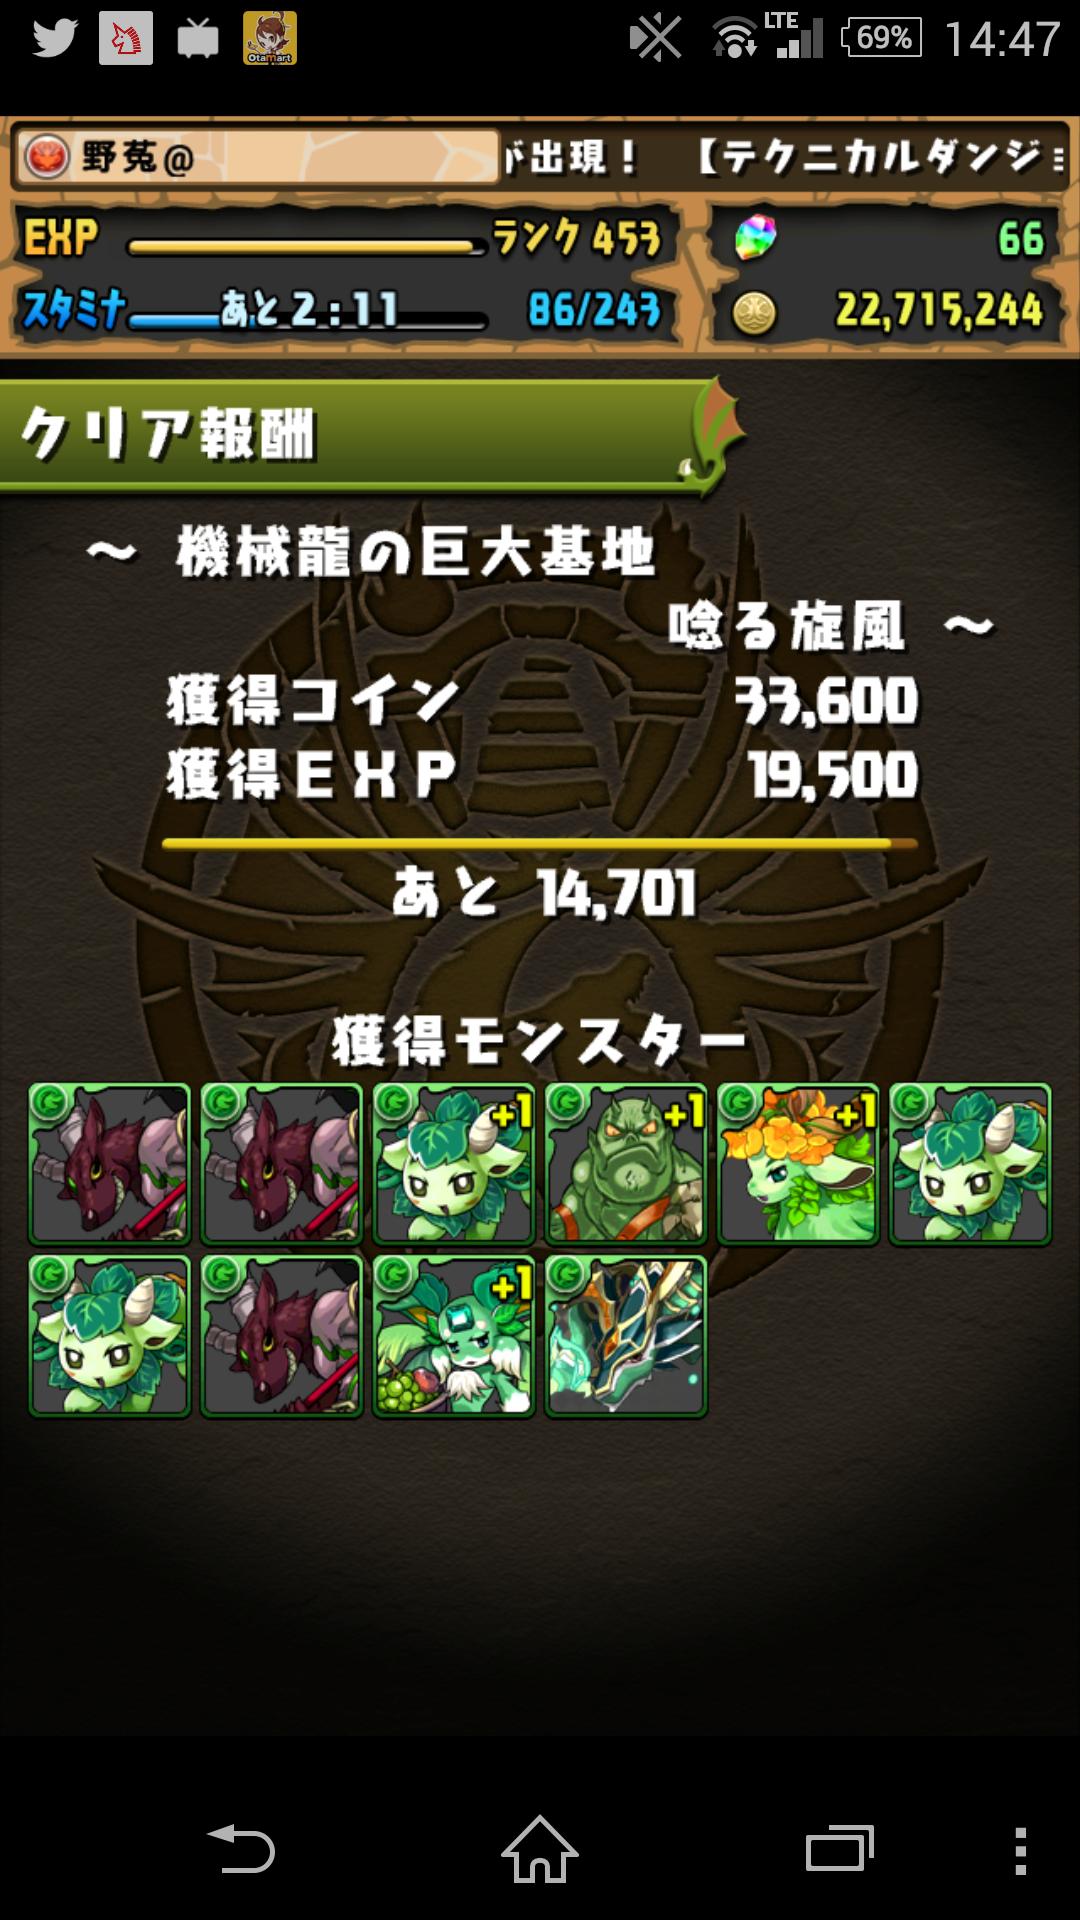 Screenshot_2015-01-26-14-47-39.png